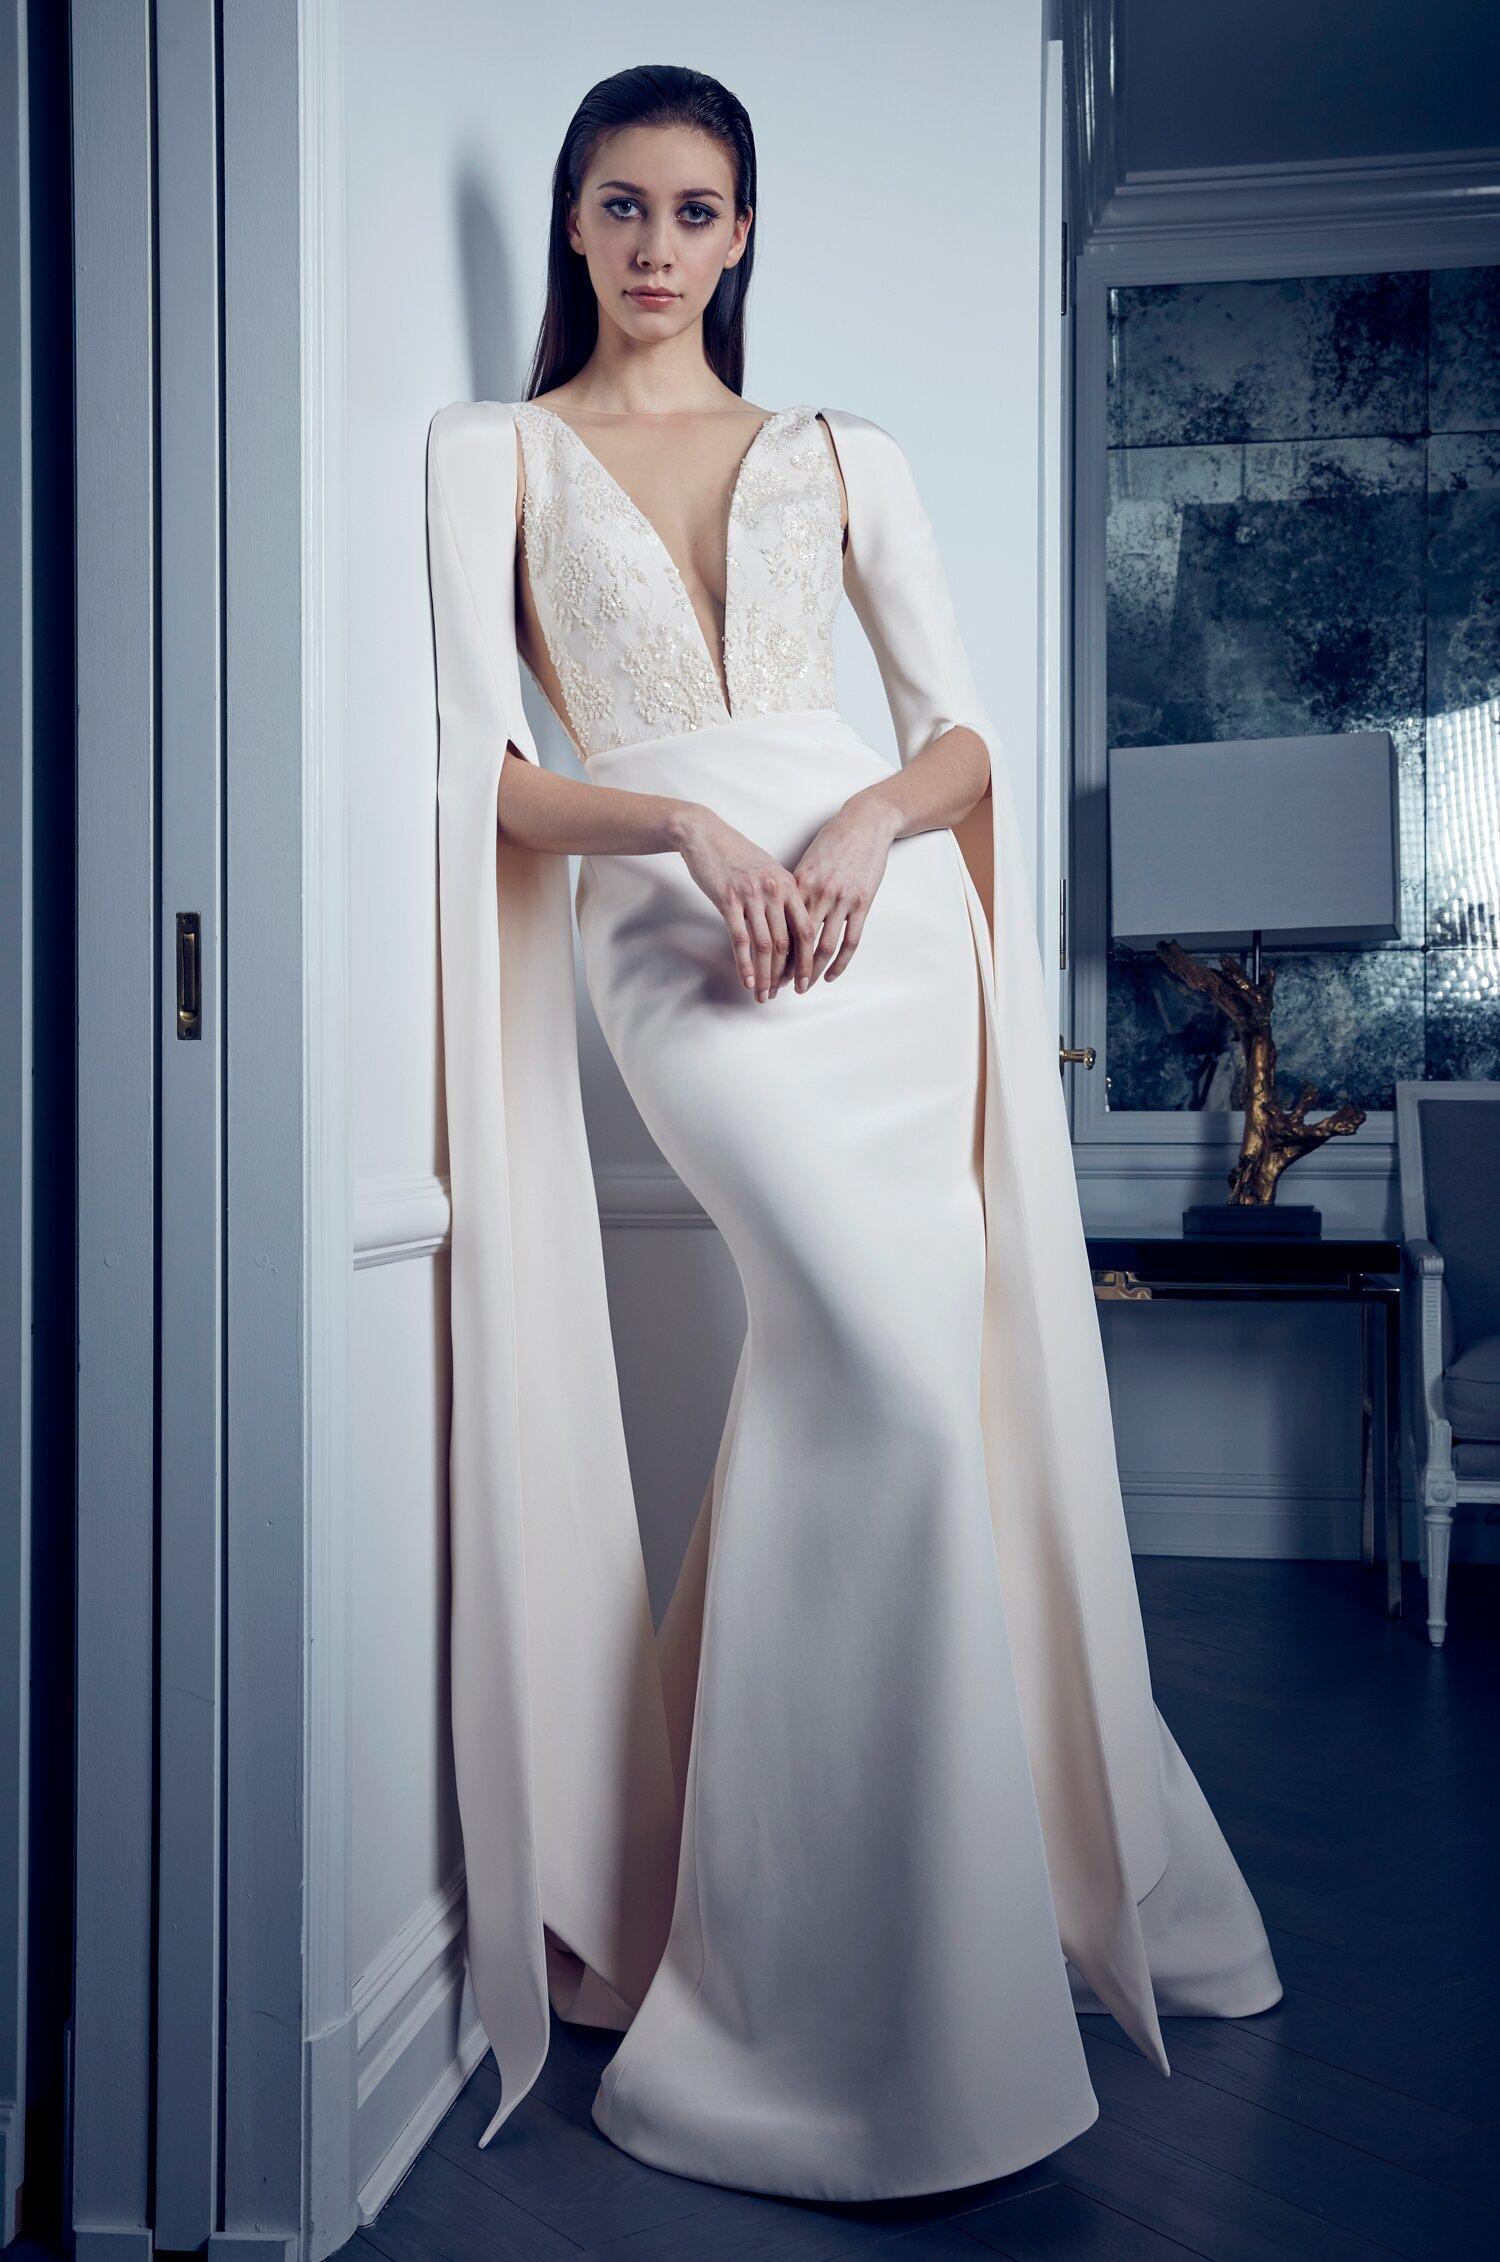 Mermaid Wedding Dresses That Bring The Drama Martha Stewart Weddings